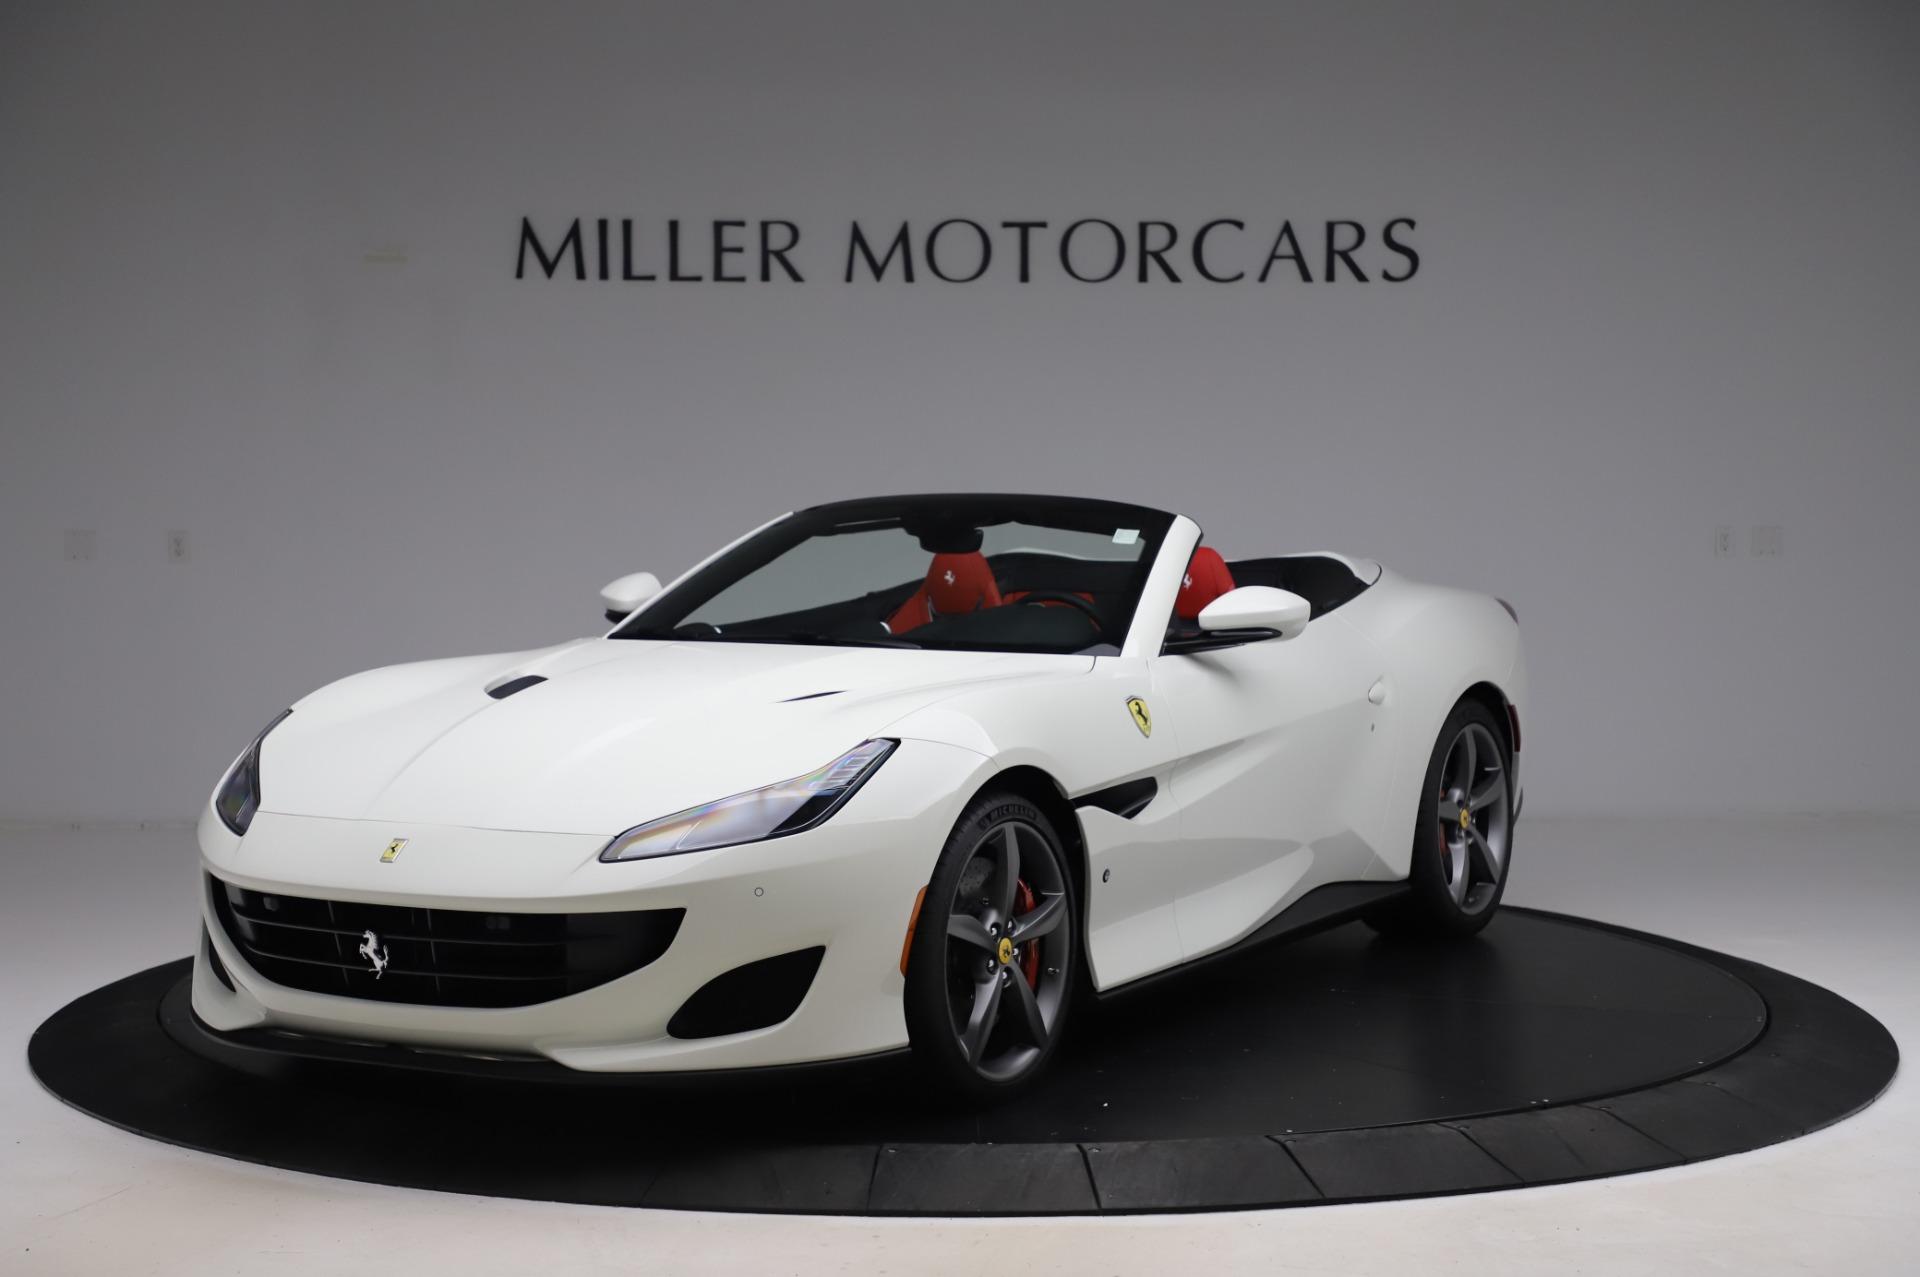 Used 2020 Ferrari Portofino Base for sale Call for price at Maserati of Westport in Westport CT 06880 1